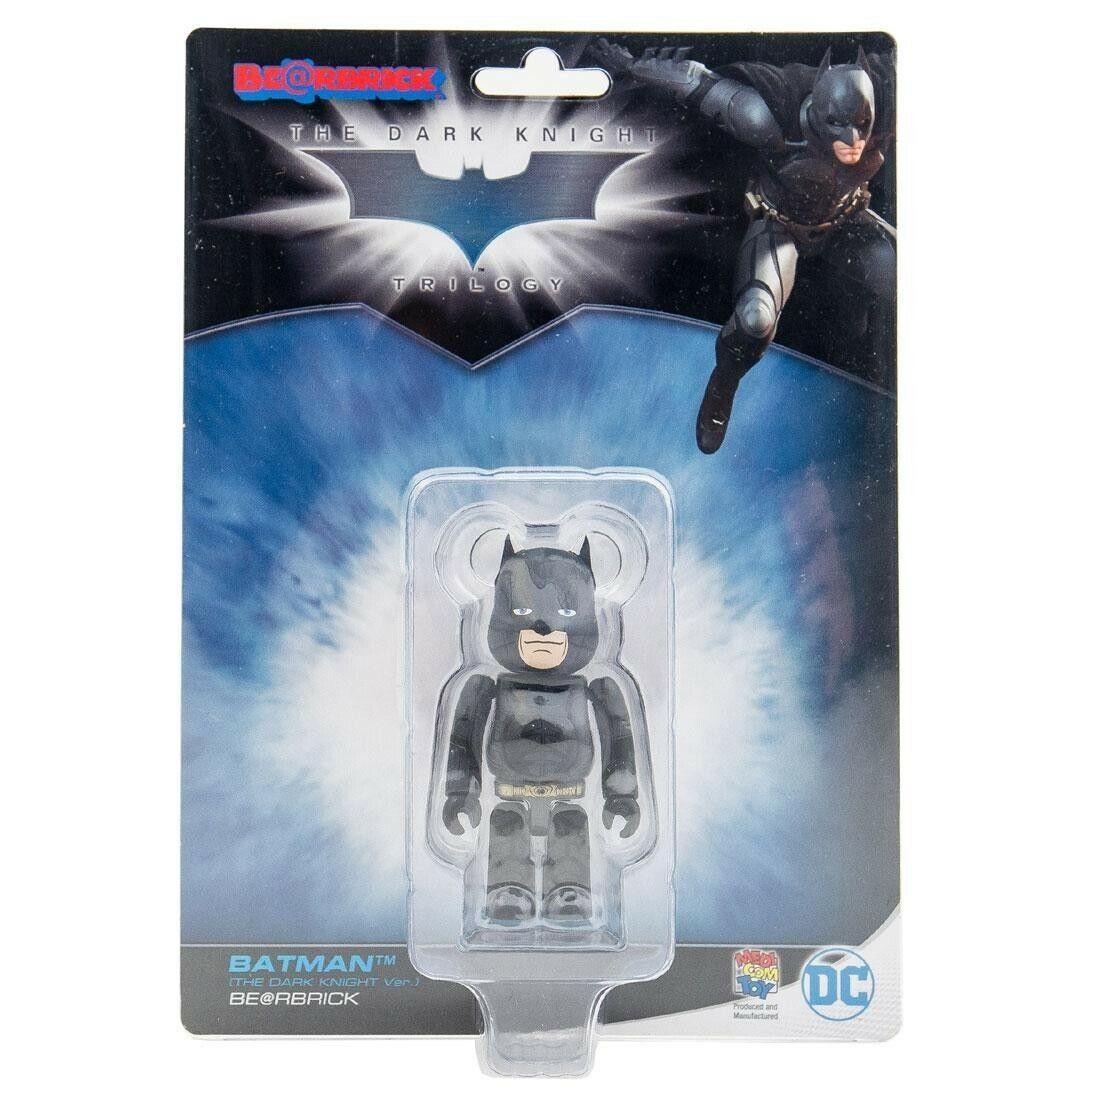 Medicom Be@rbrick 2017 Tokyo Comic Batman the Dark Knight ver 100/% Bearbrick 1pc